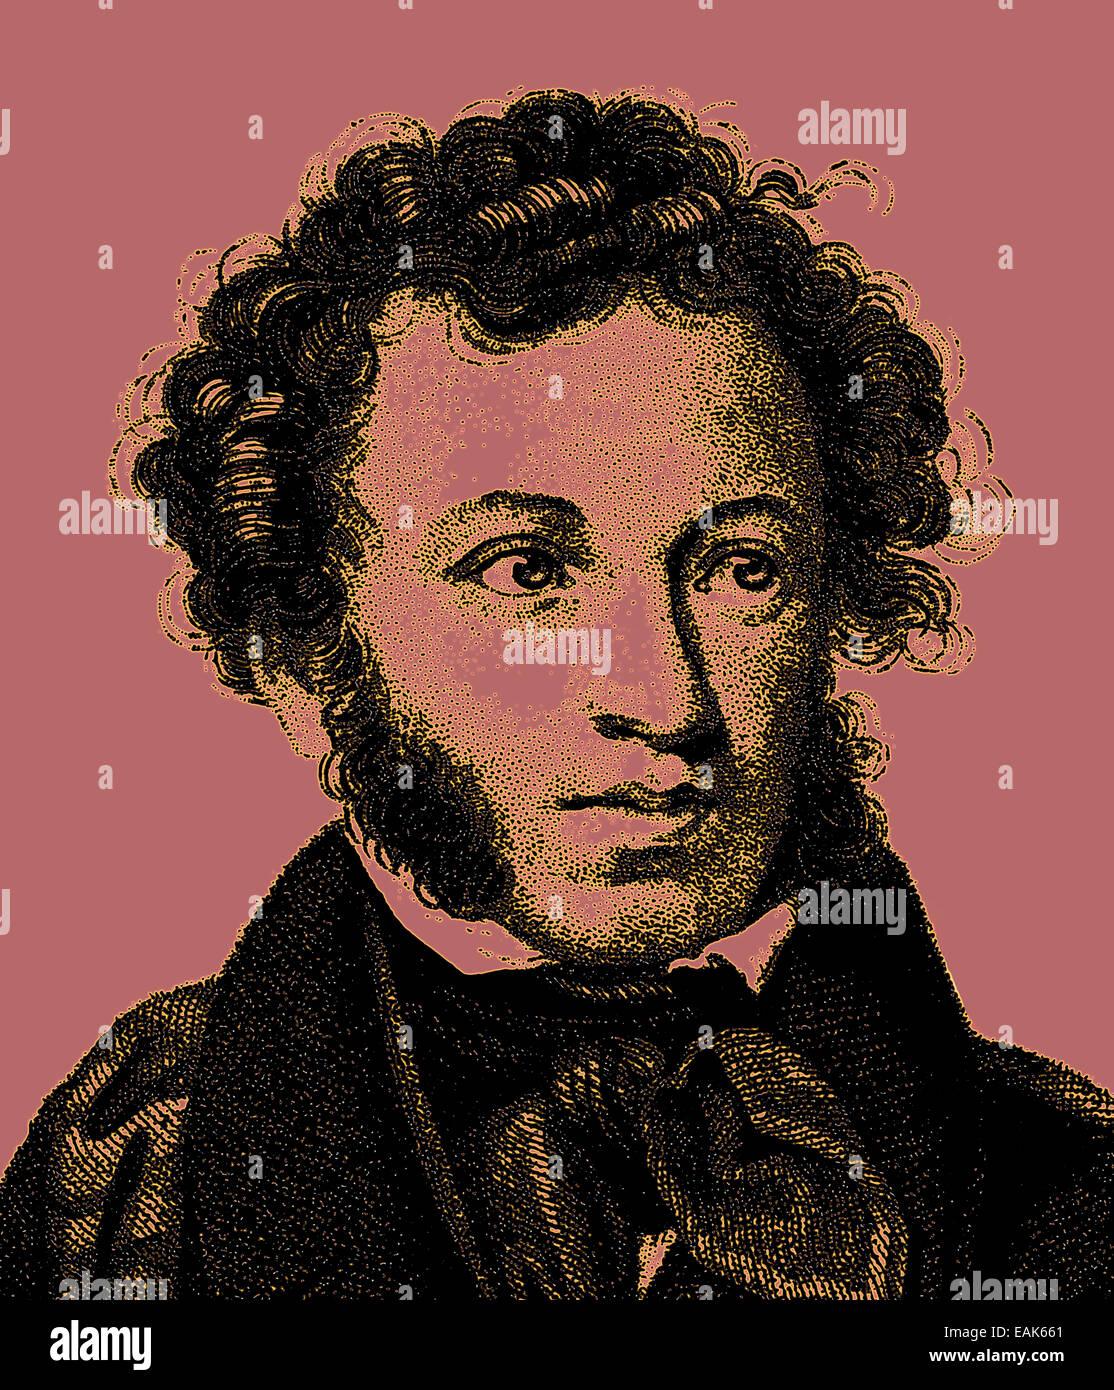 Alexander Sergeyevich Pushkin, 1799-1837, Russian poet and the founder of modern Russian literature, Portrait von - Stock Image